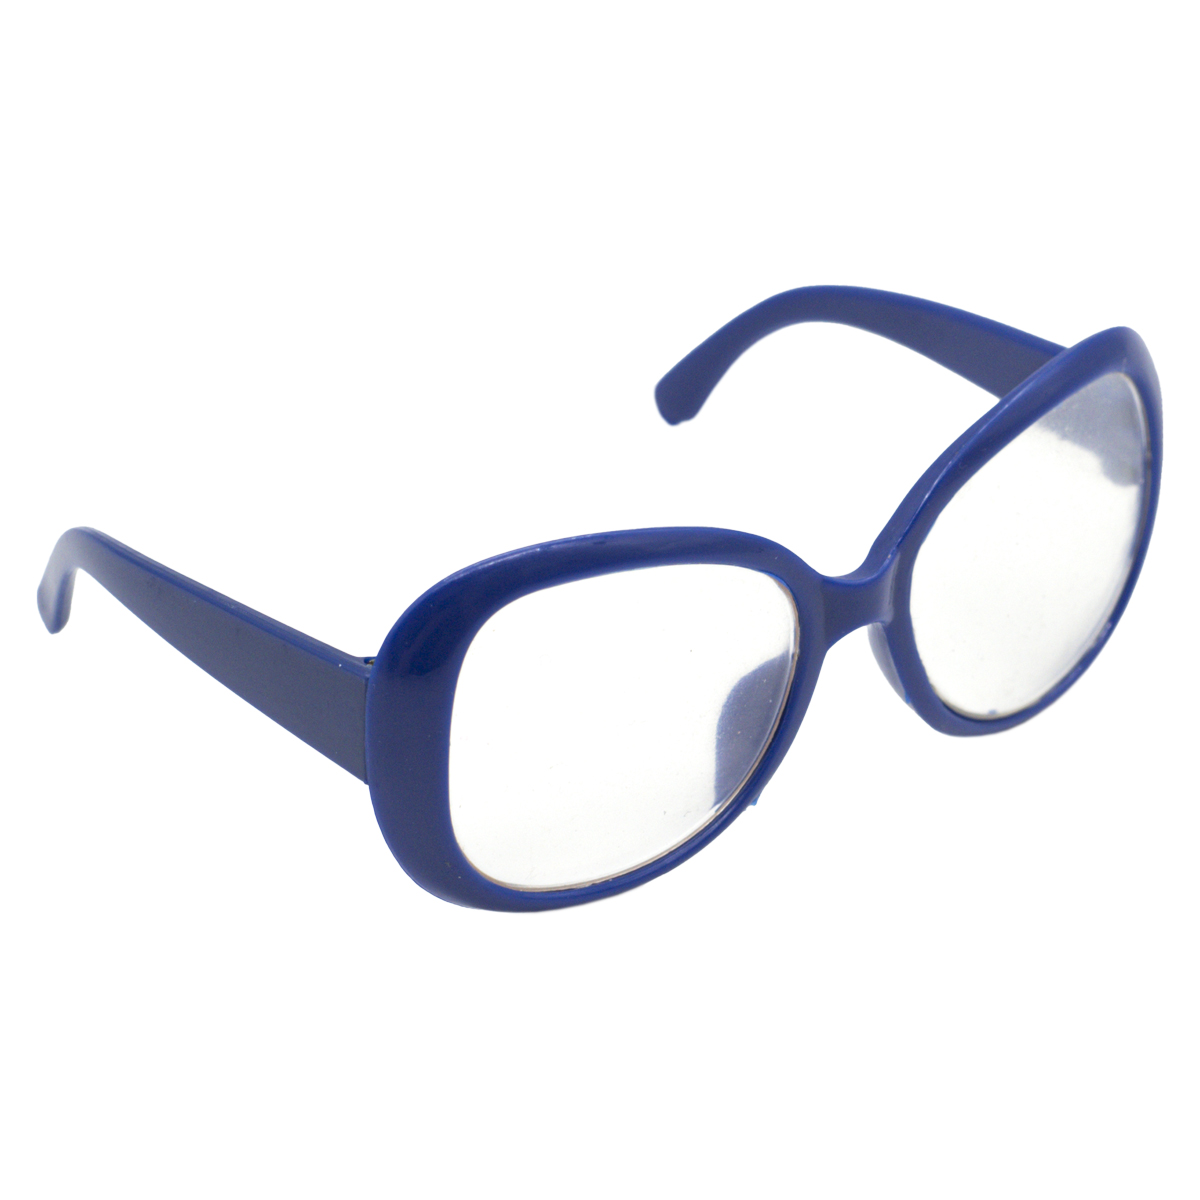 26504 Очки со стеклом, пластик, 8,5 см, 1шт